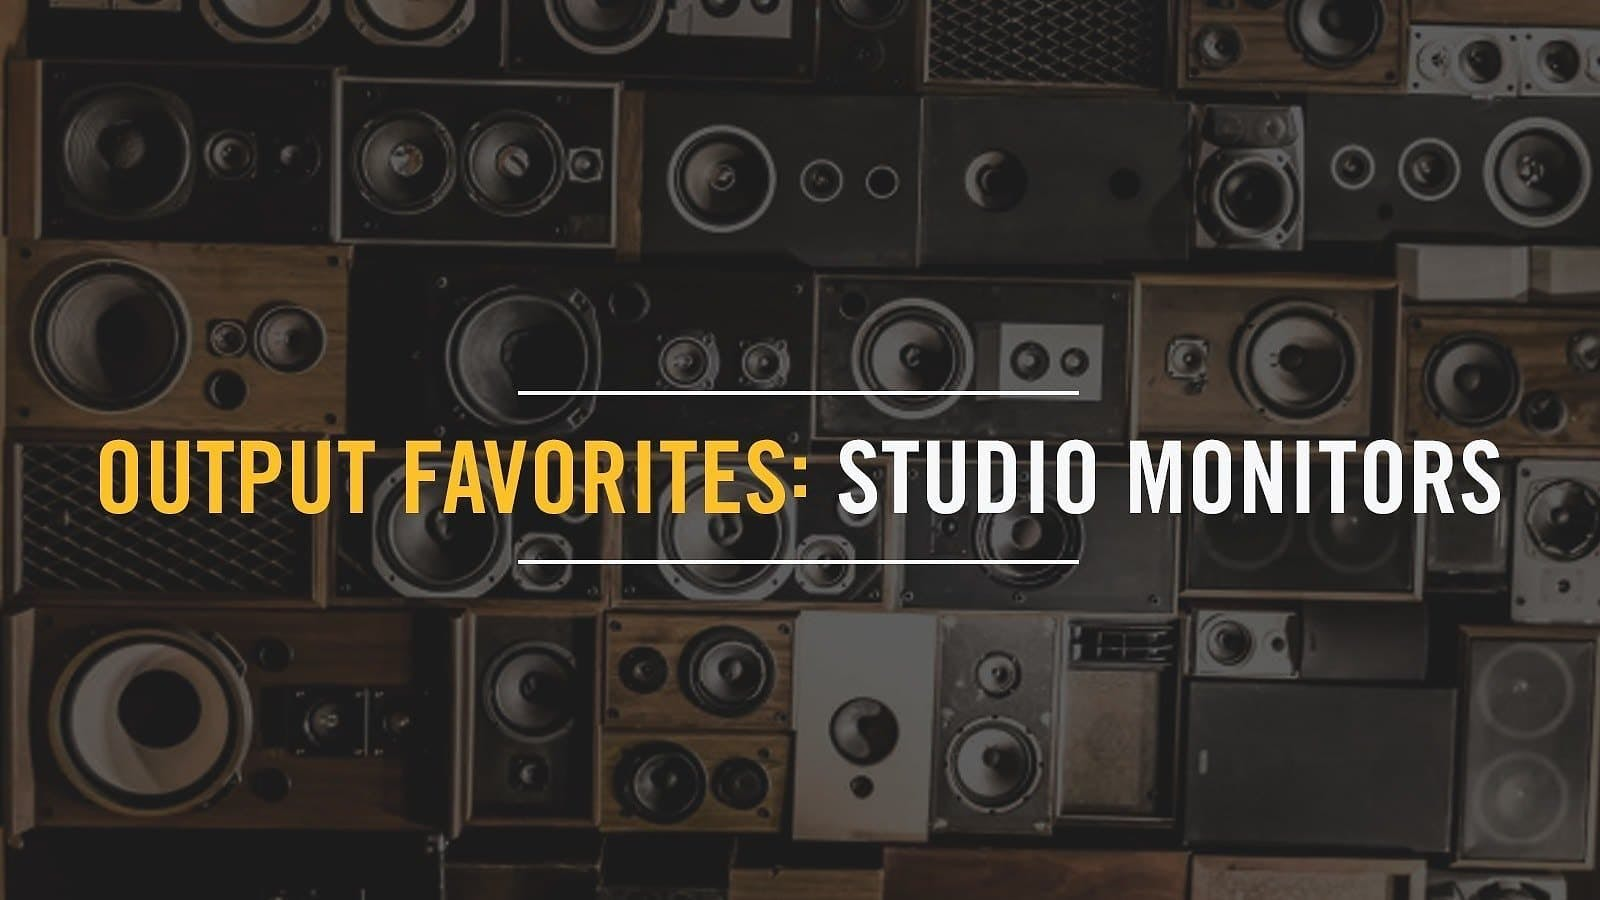 Output Favorites: Studio Monitor Speakers